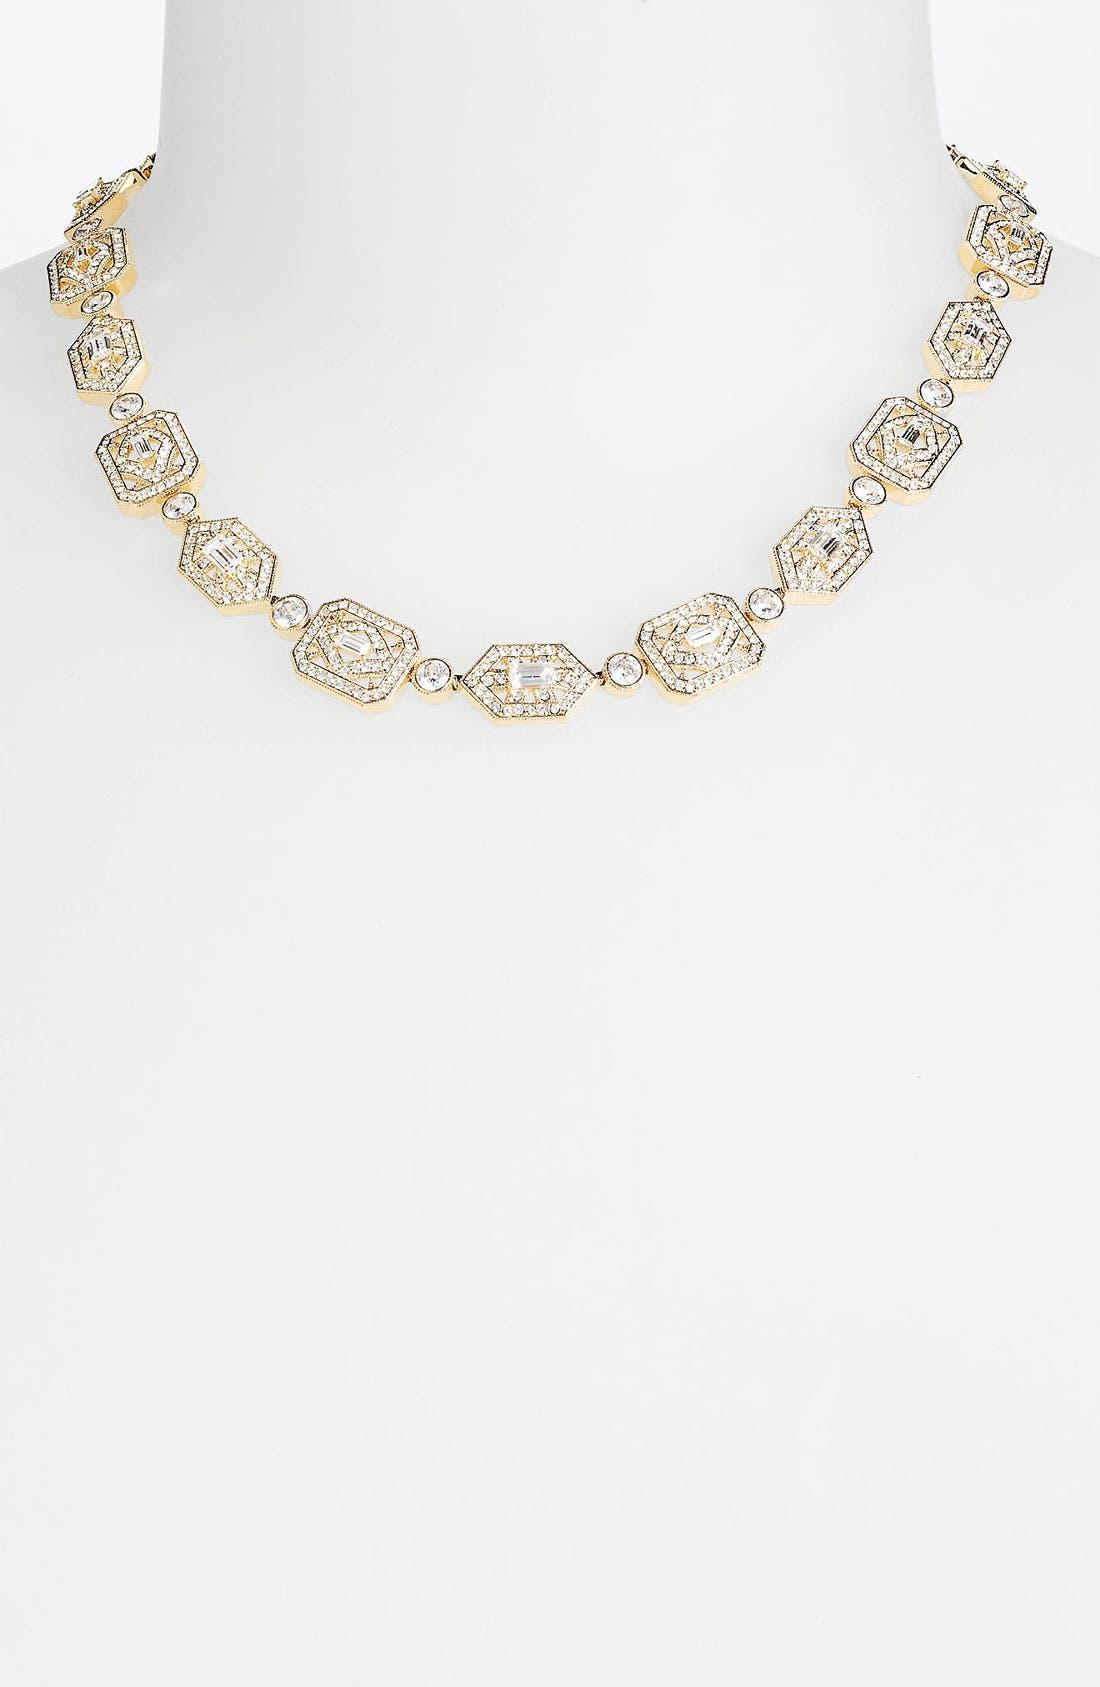 Alternate Image 1 Selected - Nadri 'Art Deco' Collar Necklace (Nordstrom Exclusive)